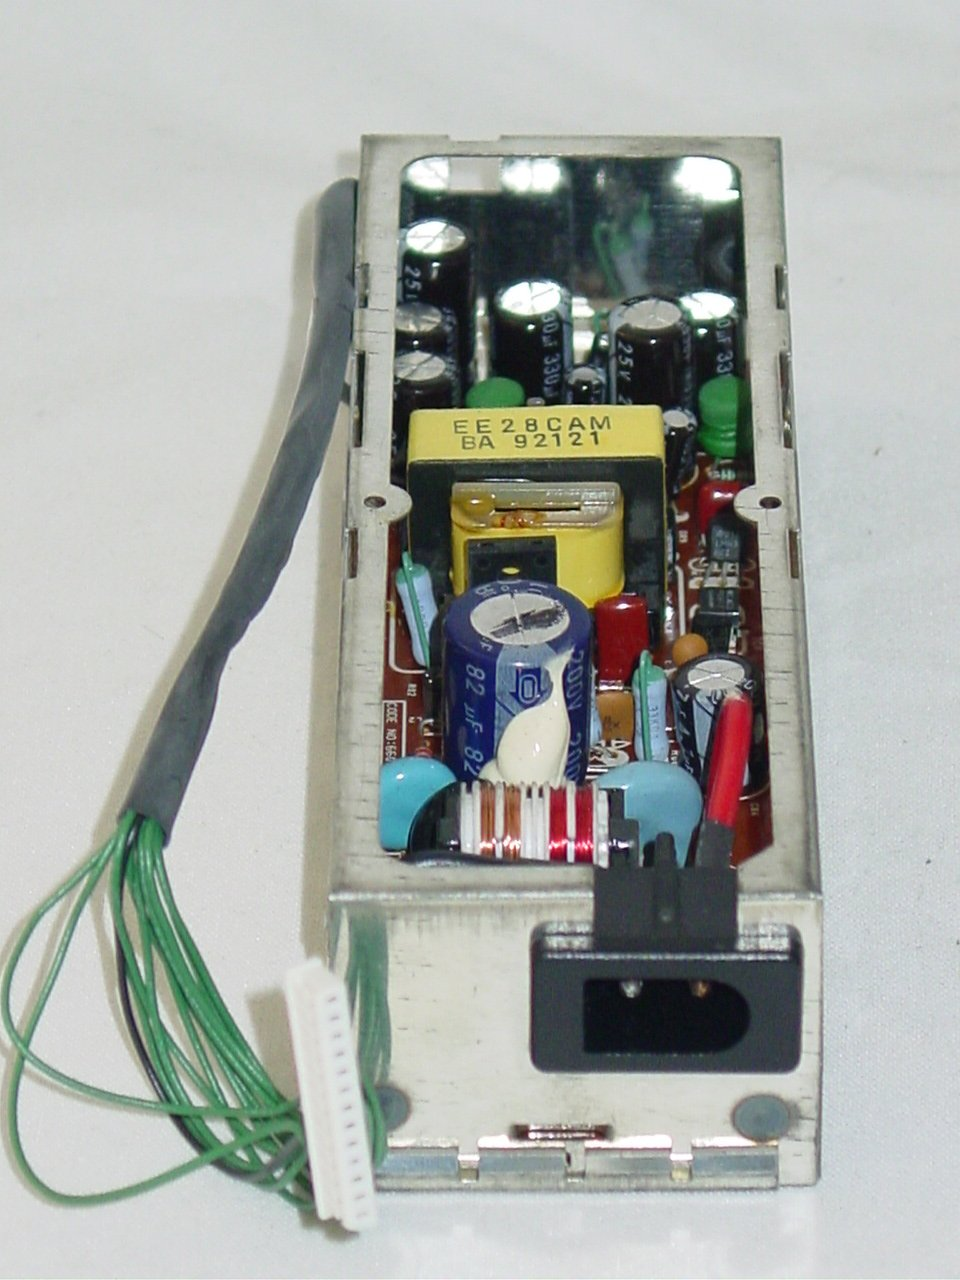 Memorex 801 8mm VCR 16-655 Power Supply Board 66029-0536-00